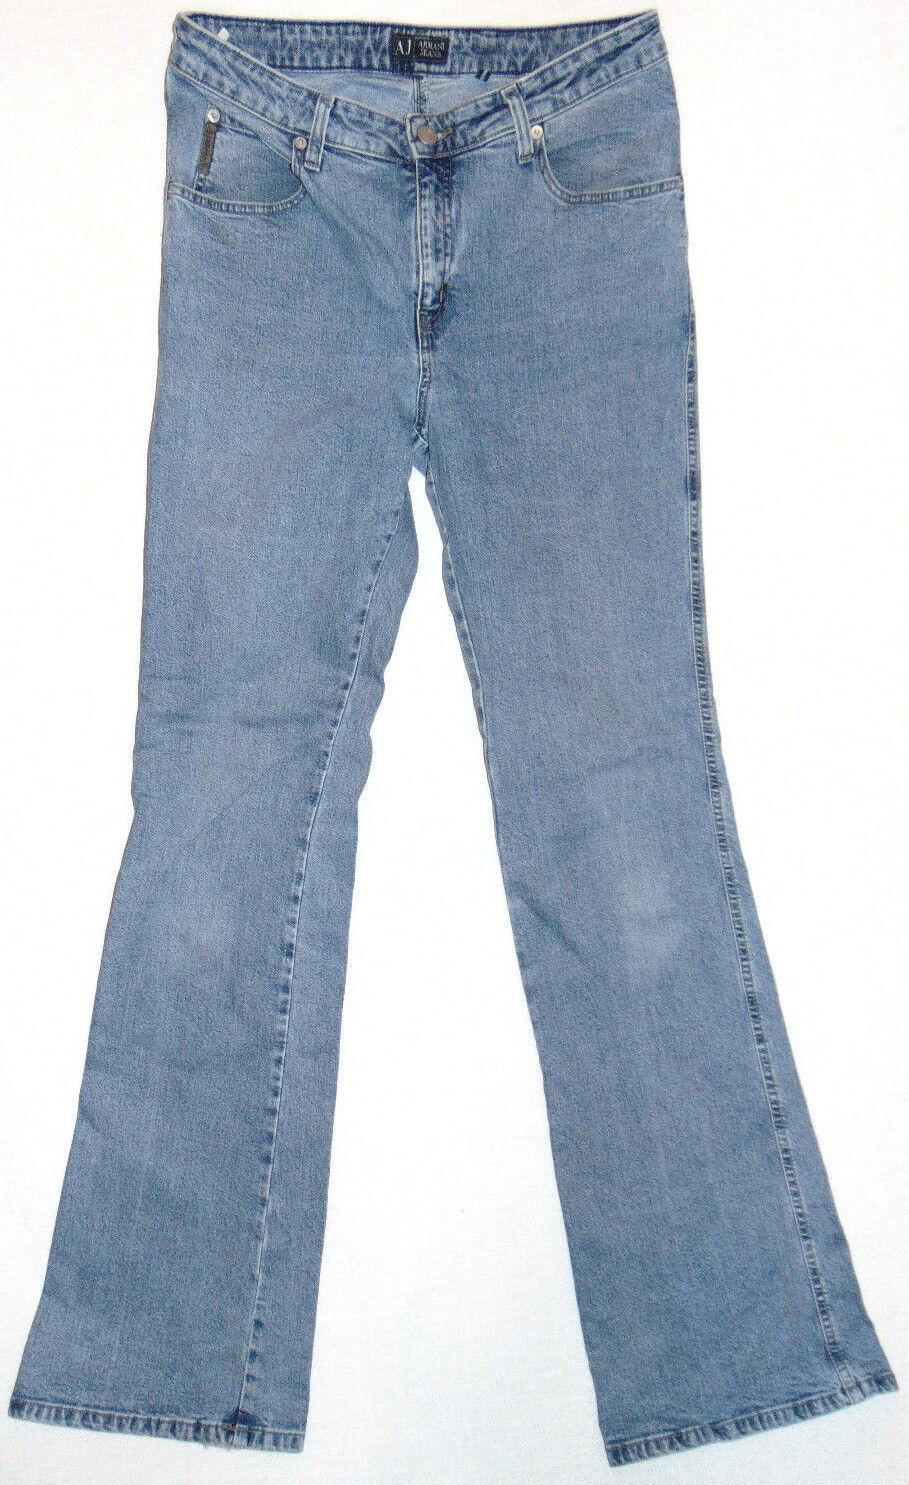 AJ Armani Indigo Series 4  W31 L34  Ladies Blau Denim Jeans - Made in